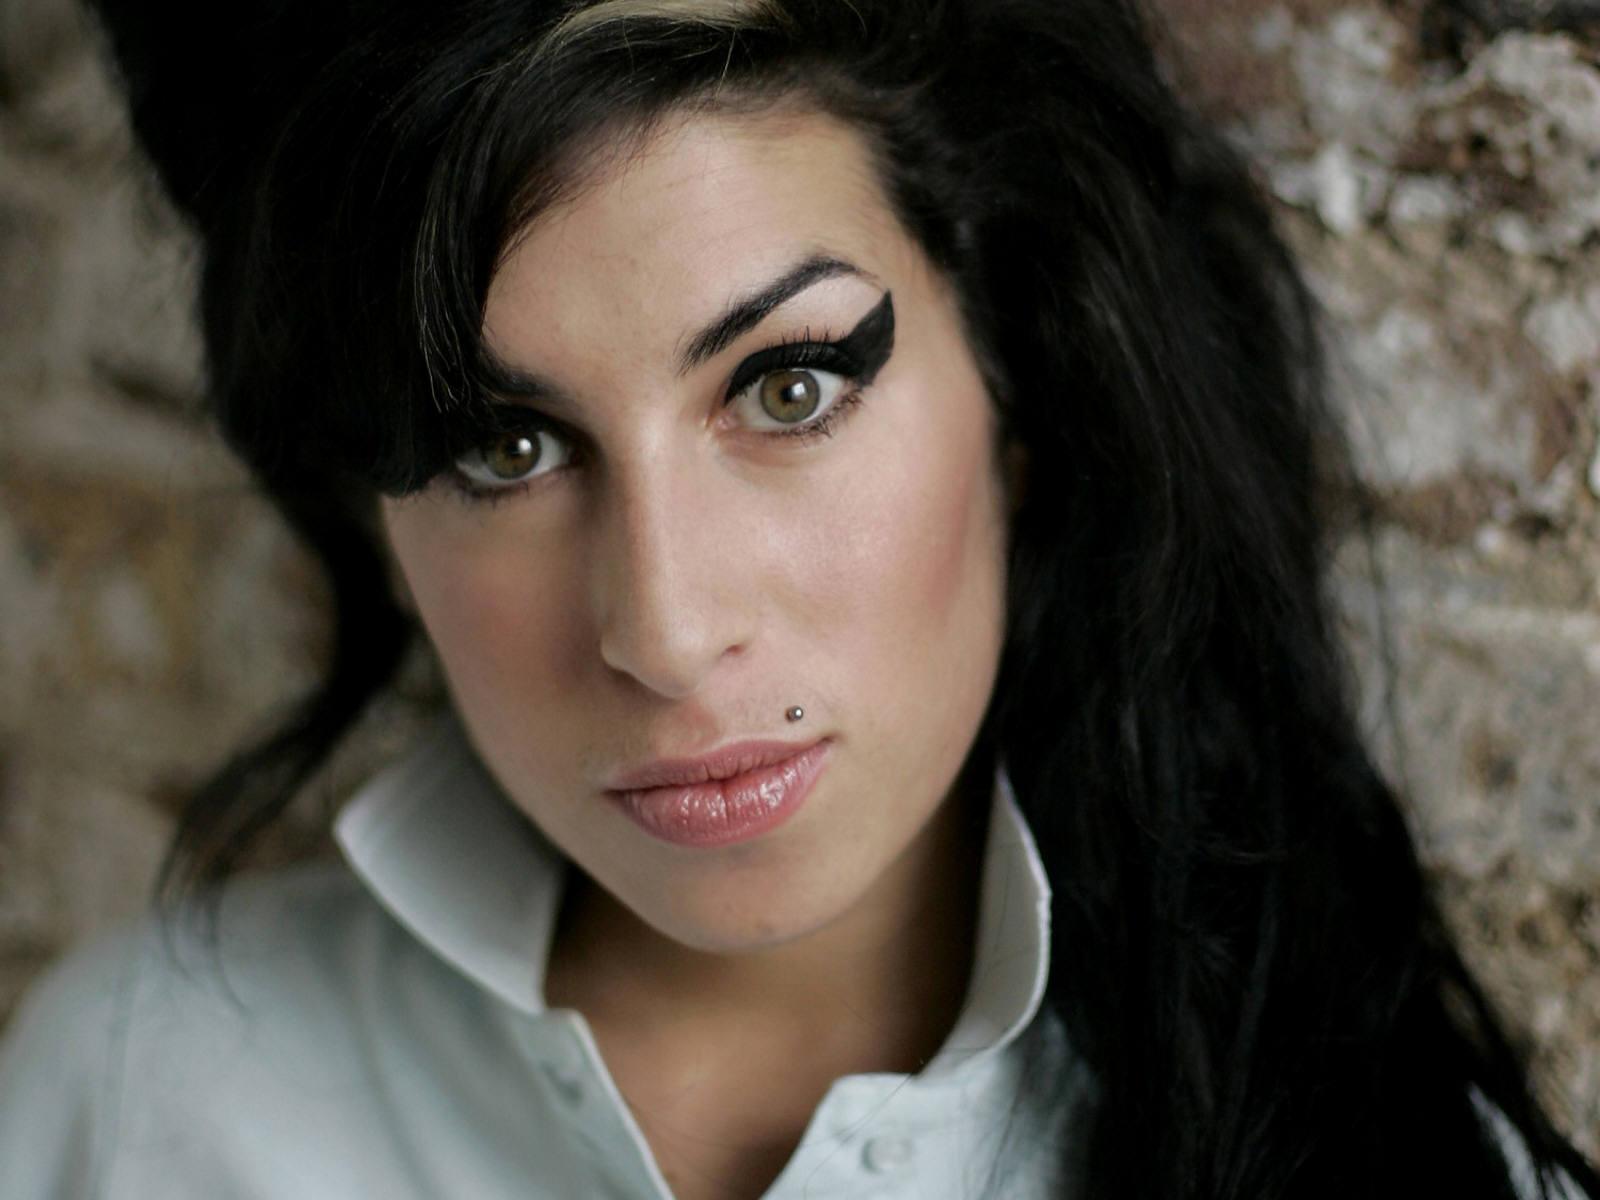 http://1.bp.blogspot.com/-hSBXwPentp0/TisCfGuyQMI/AAAAAAAAB-U/I-R_eI89nsY/s1600/Amy_Winehouse_0001_1600X1200_Wallpaper.jpg